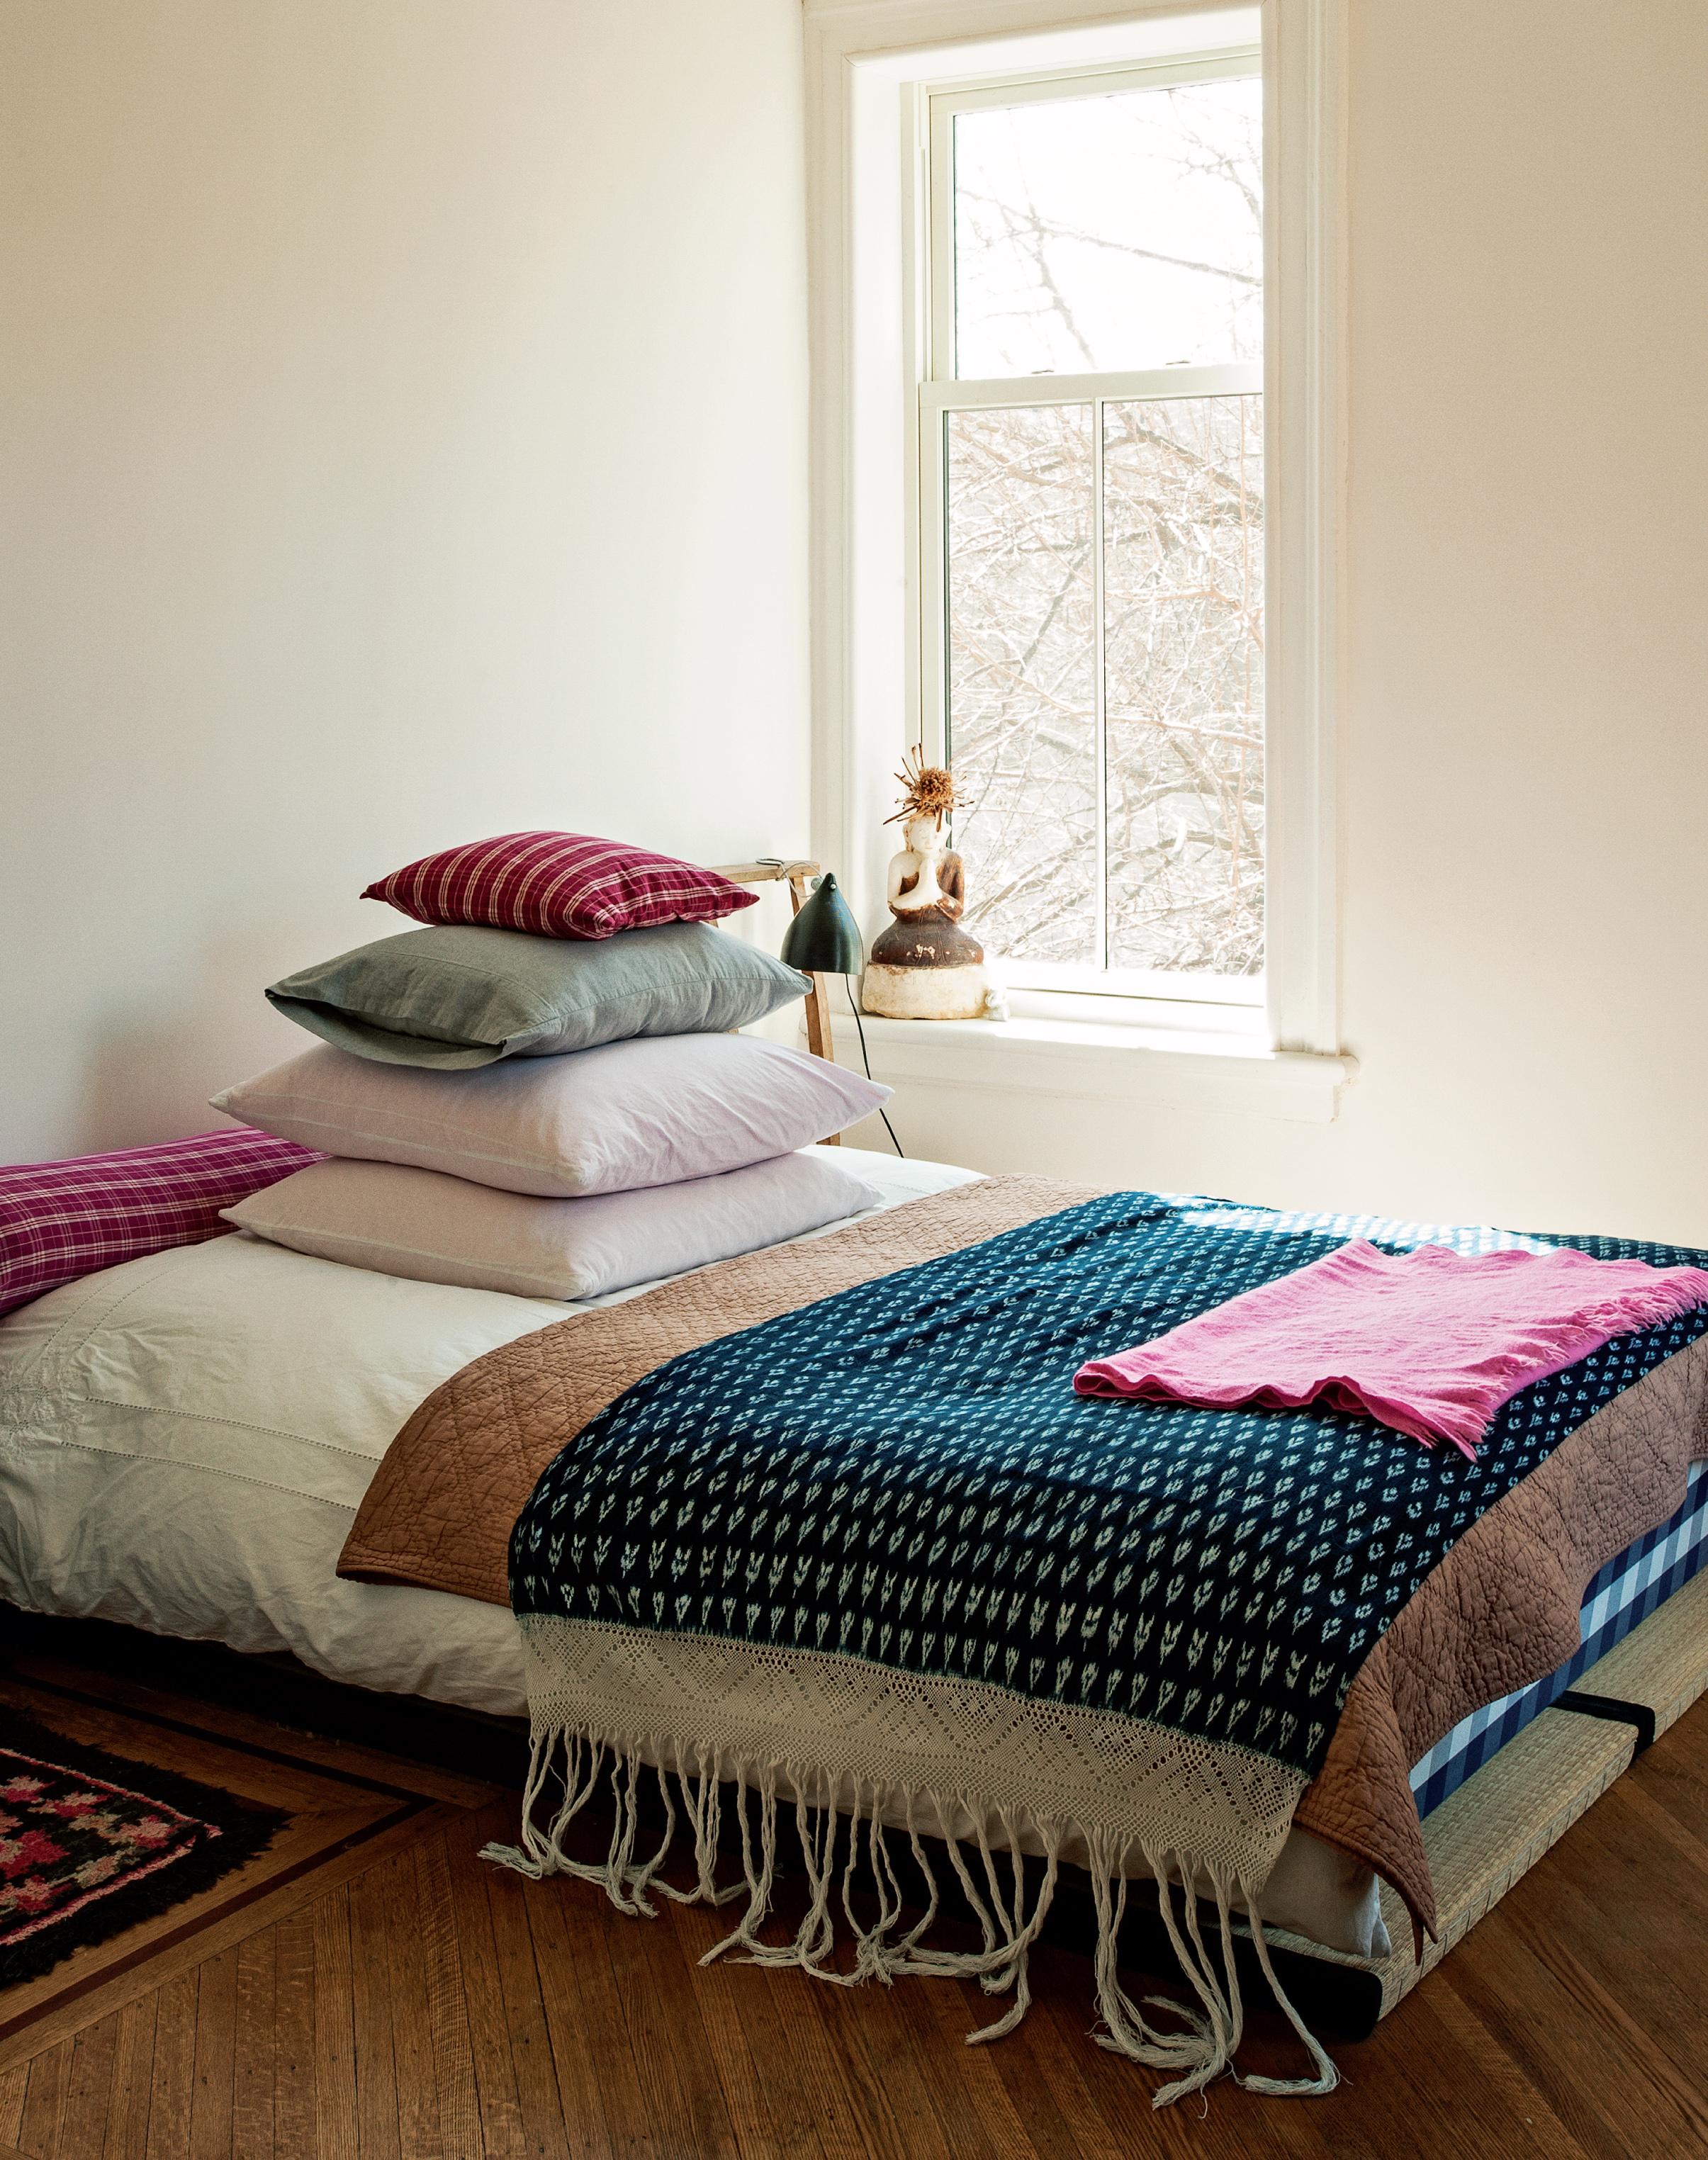 Brooklyn Interiors : La maison bohème de la designer Mona Kowalska - Photo : Matthew Williams